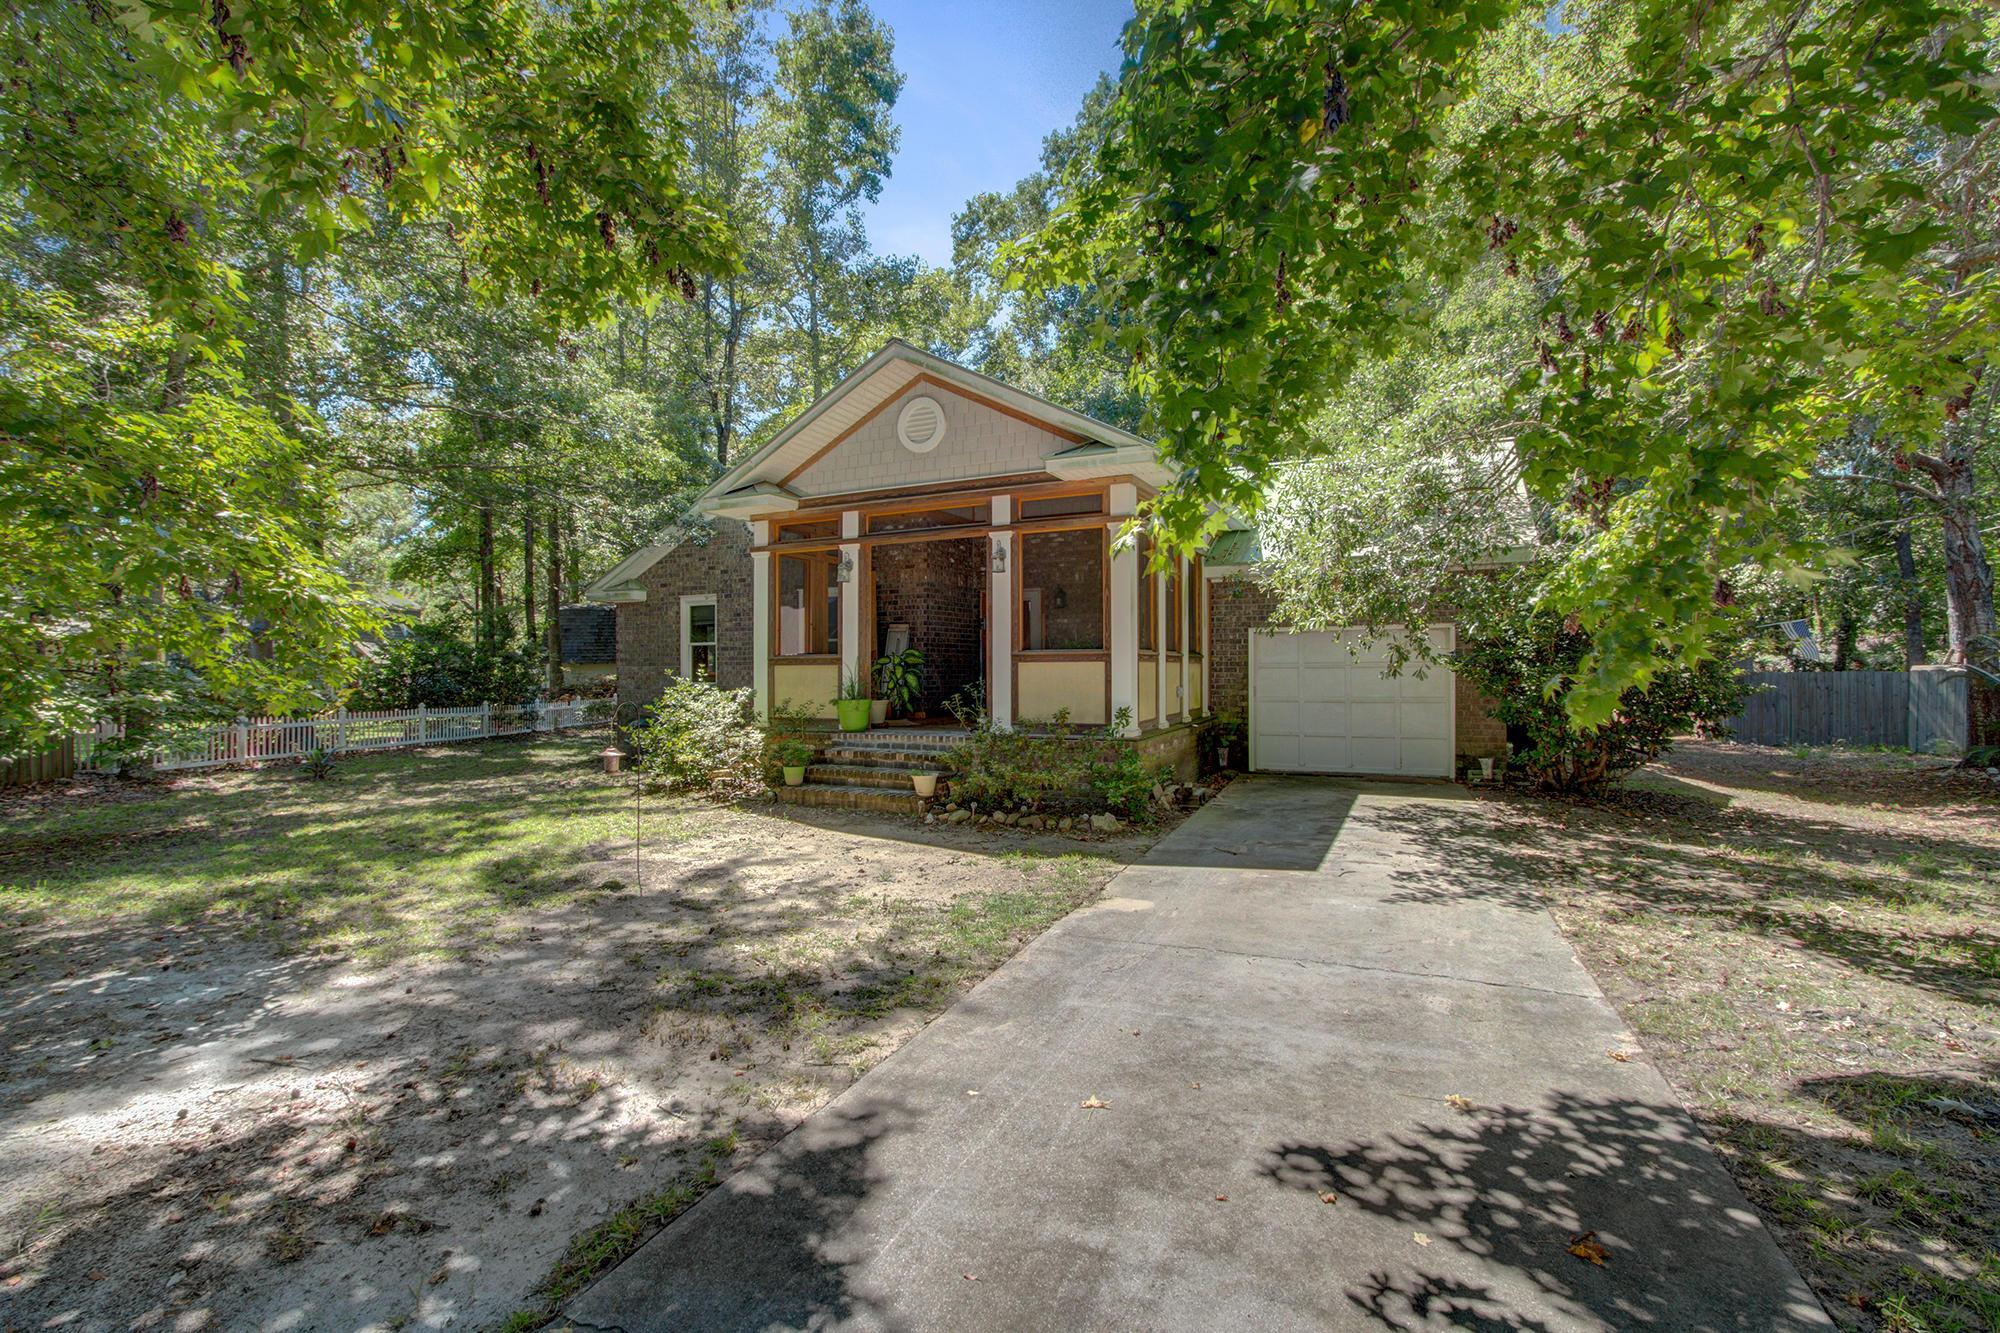 Wando Lakes Homes For Sale - 858 Fairlawn, Mount Pleasant, SC - 3